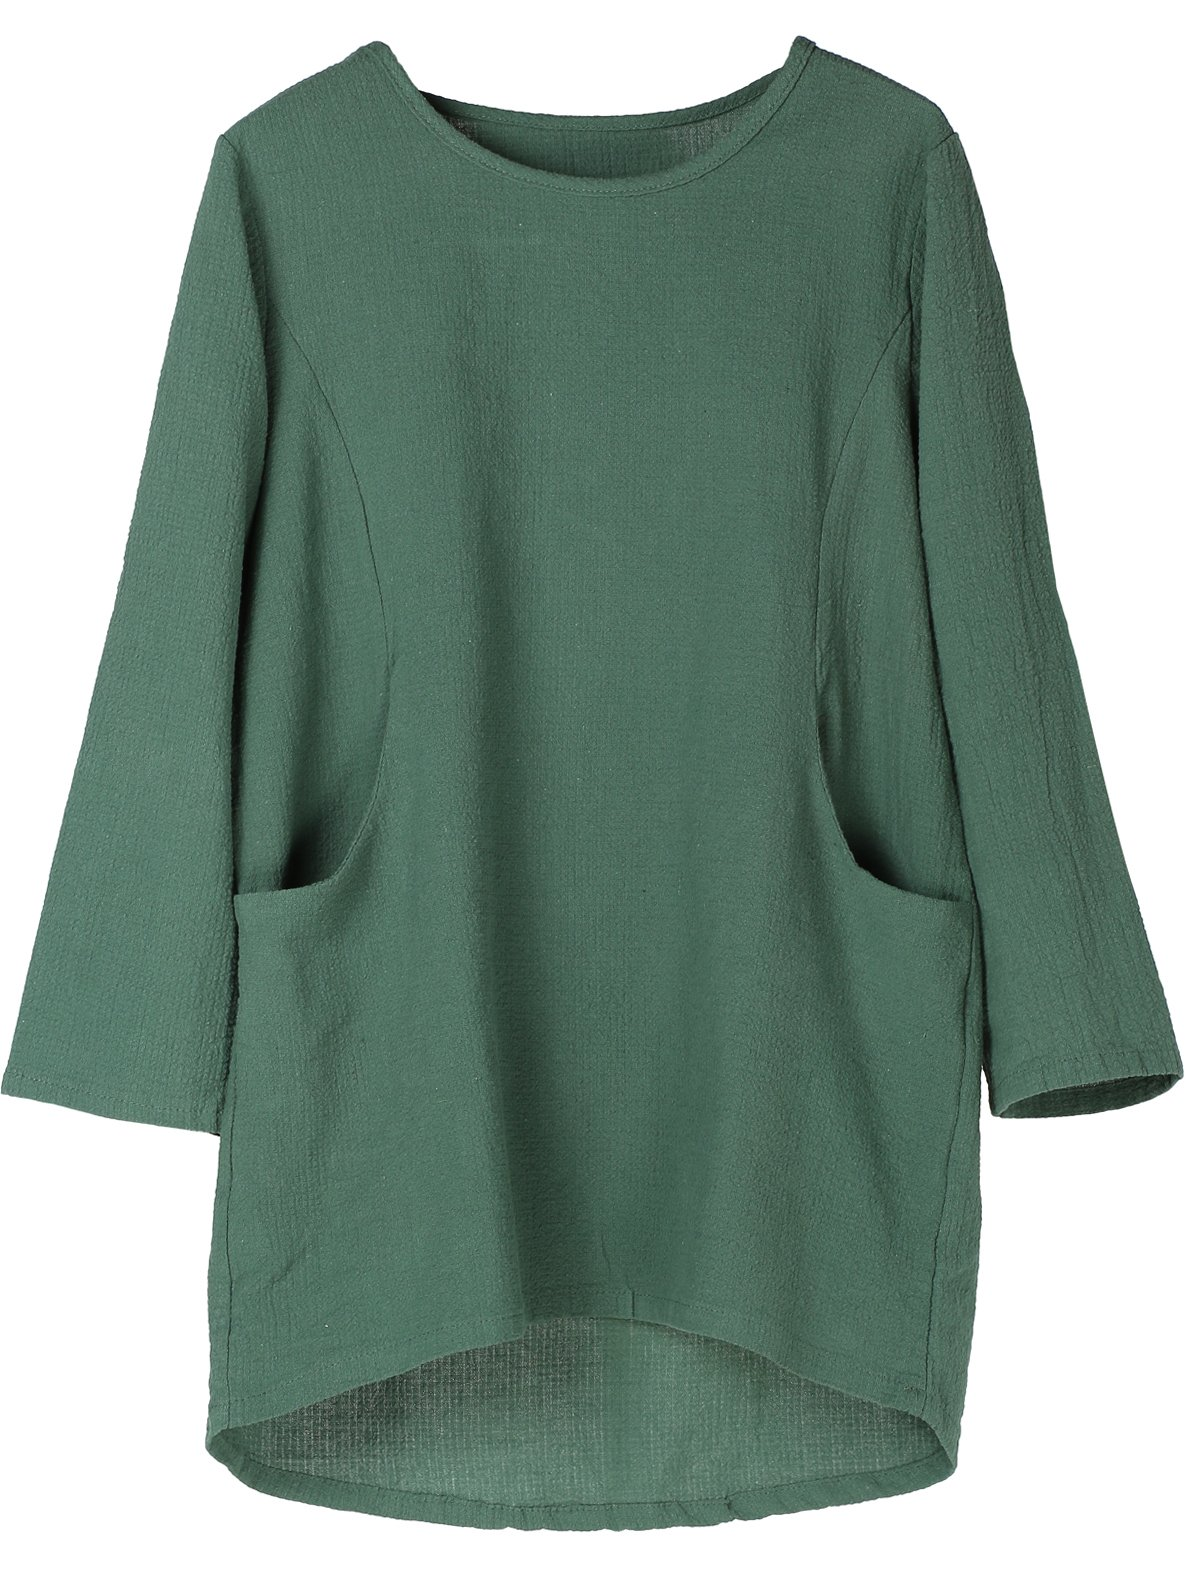 Minibee Women's Cotton Linen 4/5 Sleeve Tunic/Top Tees (2XL, Green)